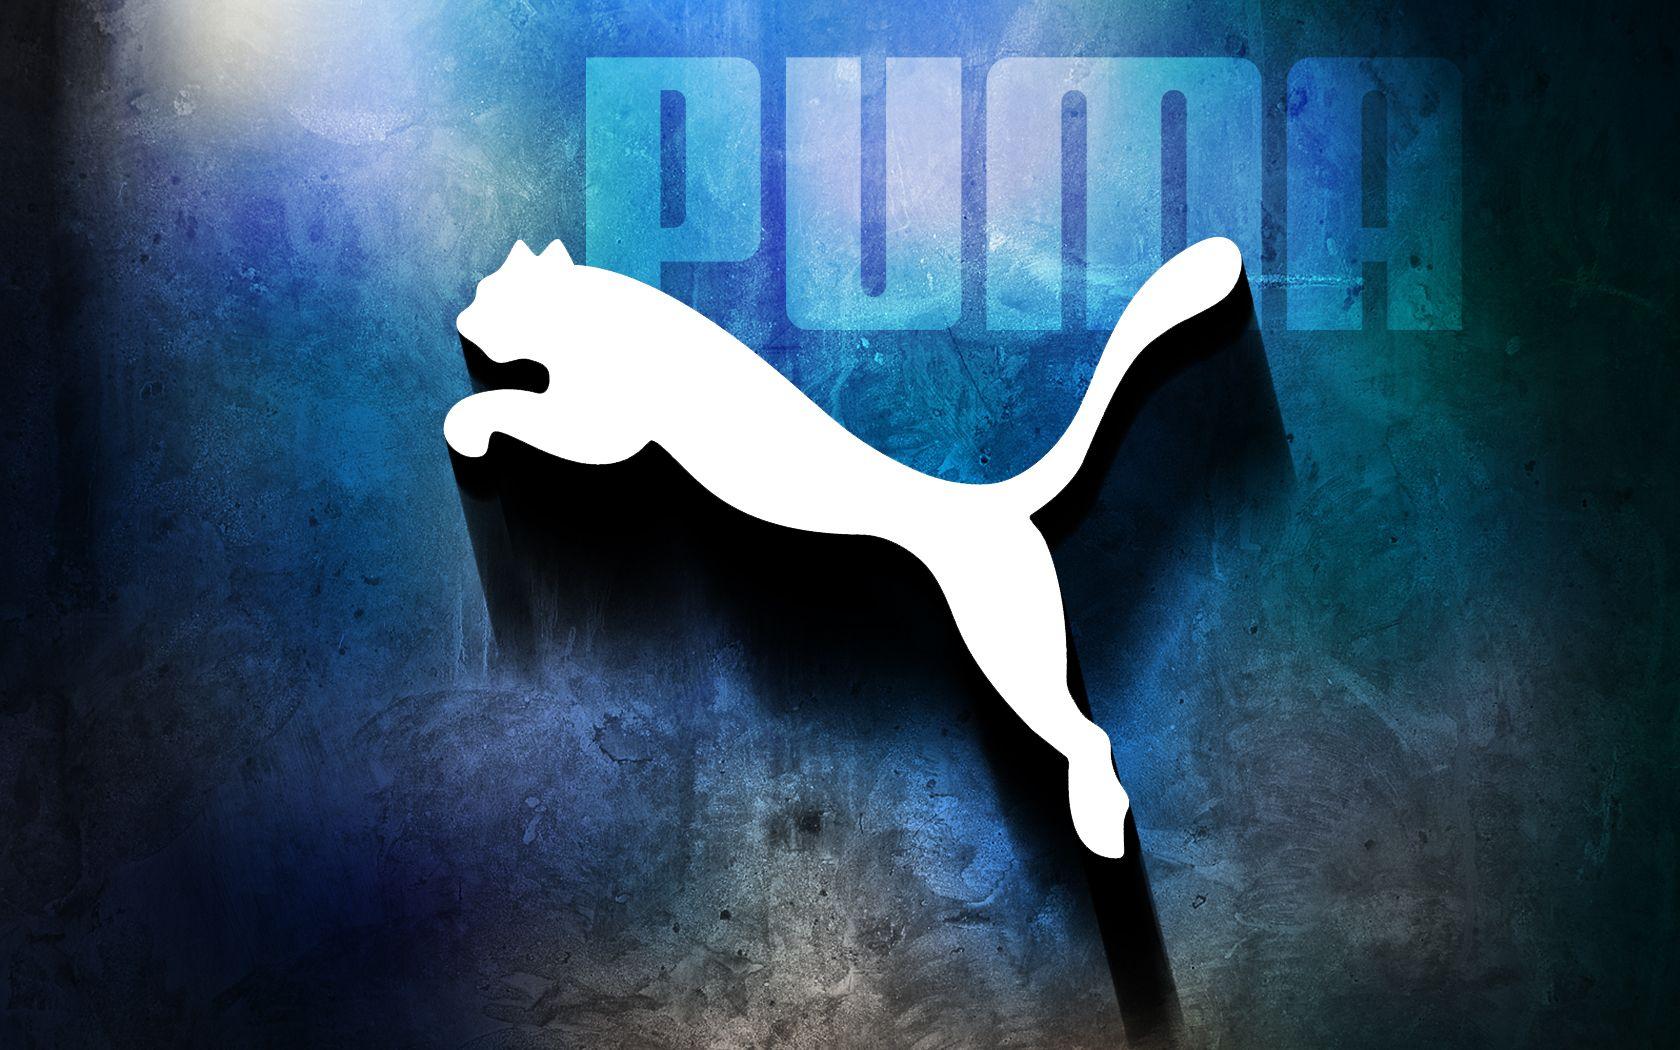 Puma Blue Background Puma wallpaper, Fondos de pantalla